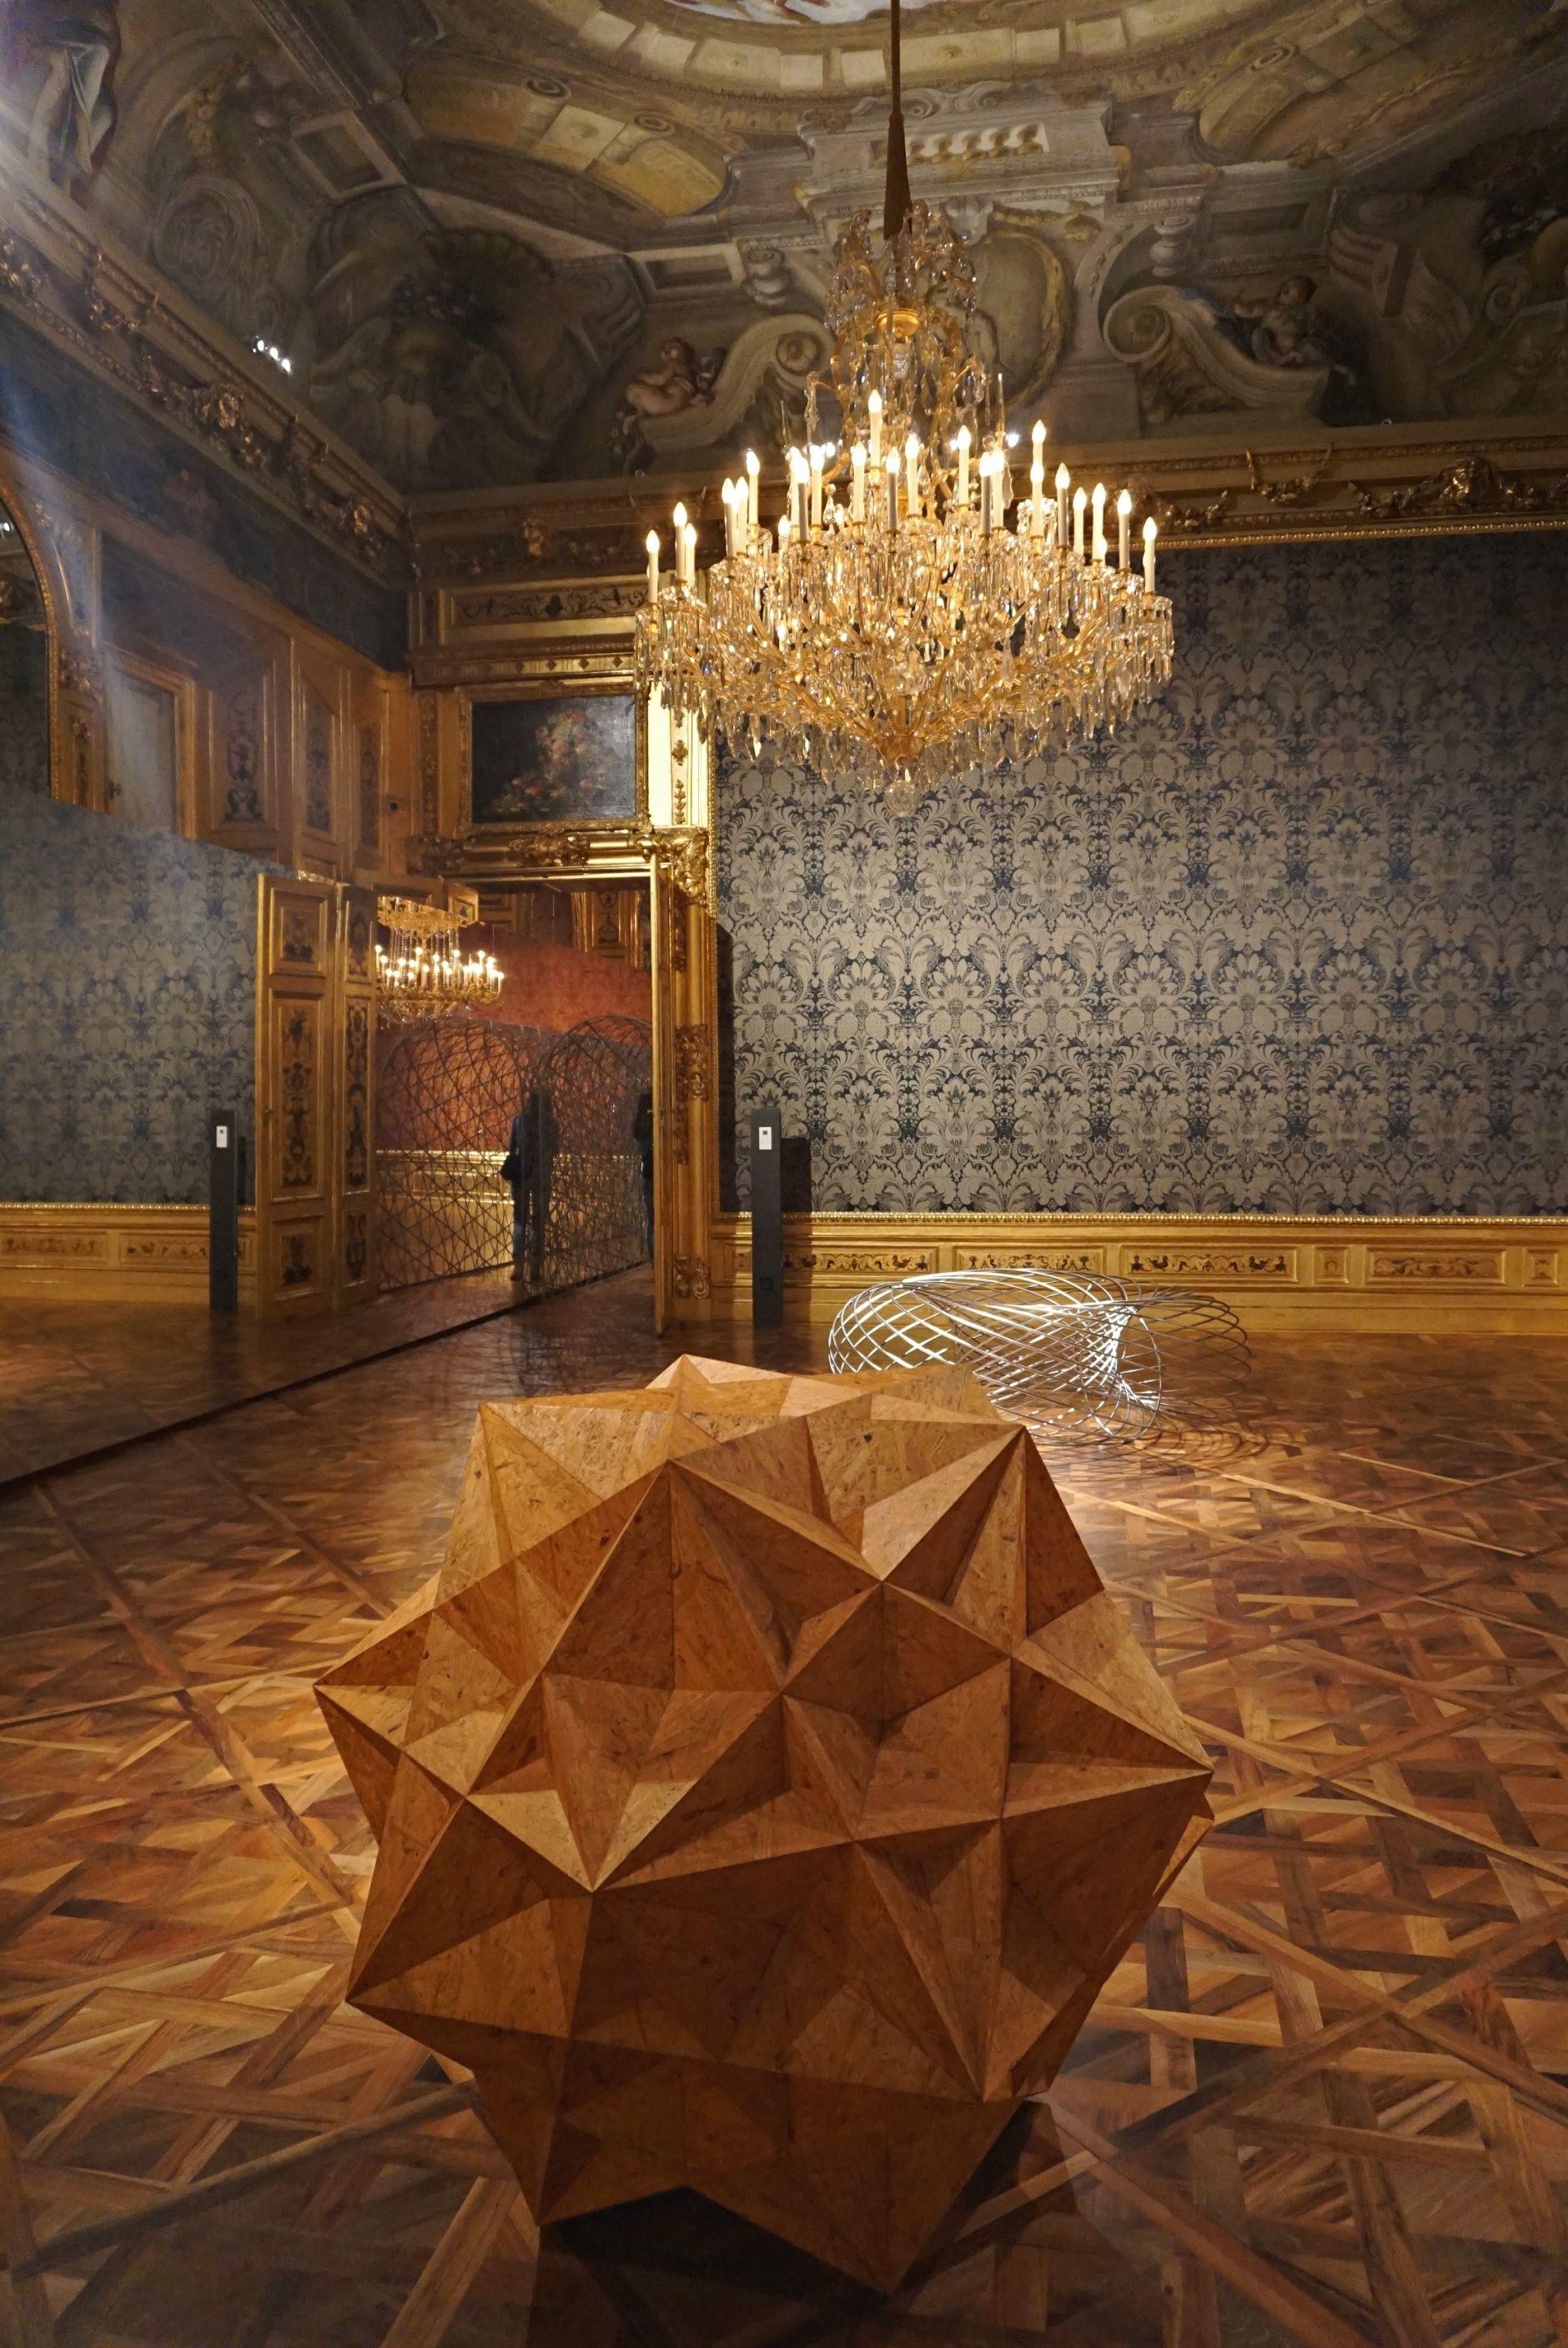 dc-art-olafur-eliasson-baroque-baroque-the-winter-palace-of-prince-eugene-of-savoy-vienna-06